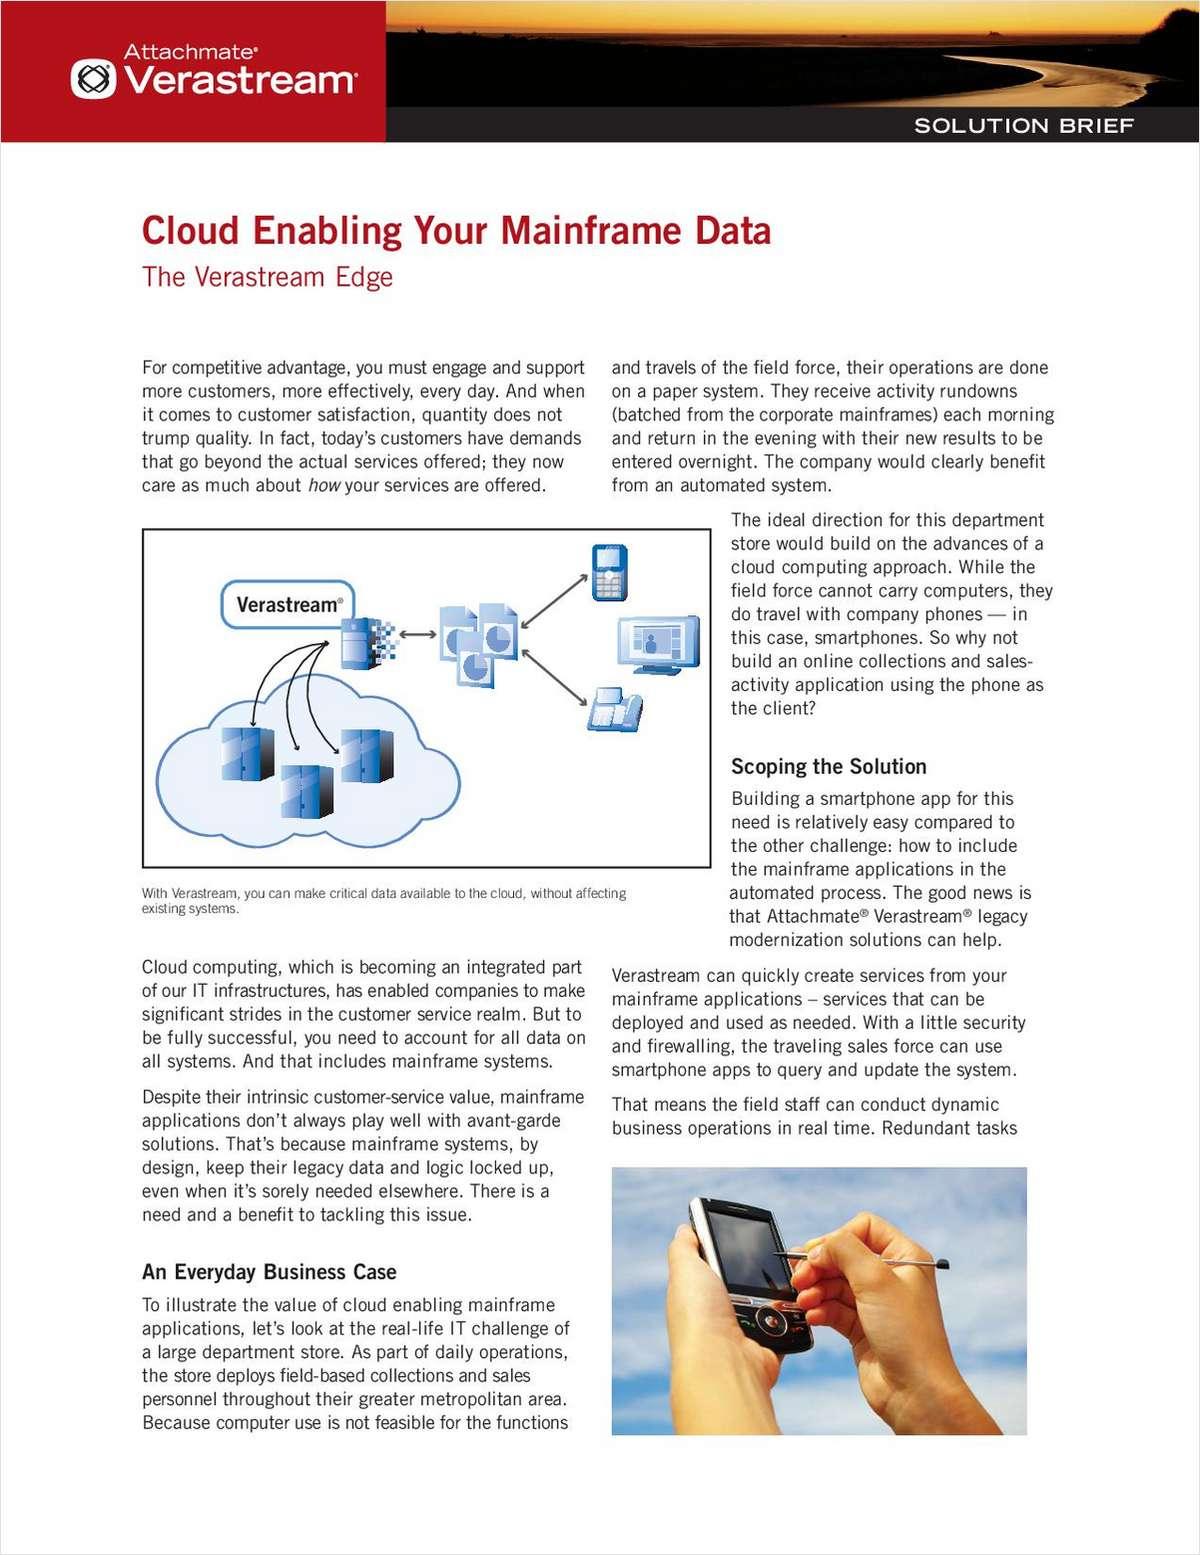 Cloud Enabling Your Mainframe Data: The Verastream Edge